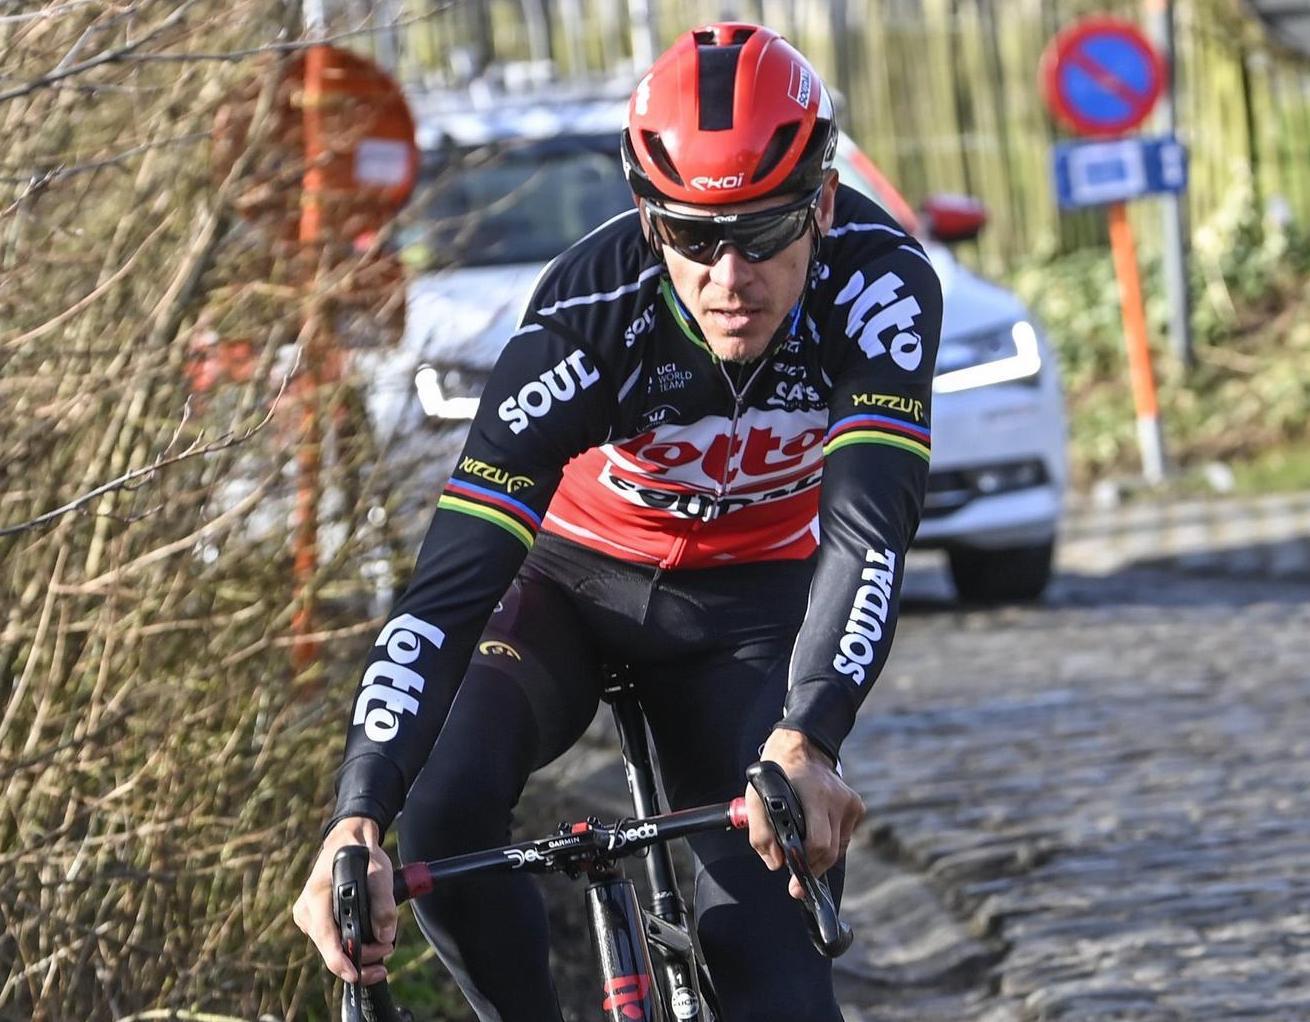 Omloop Het Nieuwsblad 2021 -75h Edition - Training - Flanders Classics - 25/02/2021 - Philippe Gilbert (BEL - Lotto Soudal) - photo Nico Vereecken/PN/BettiniPhoto©2021